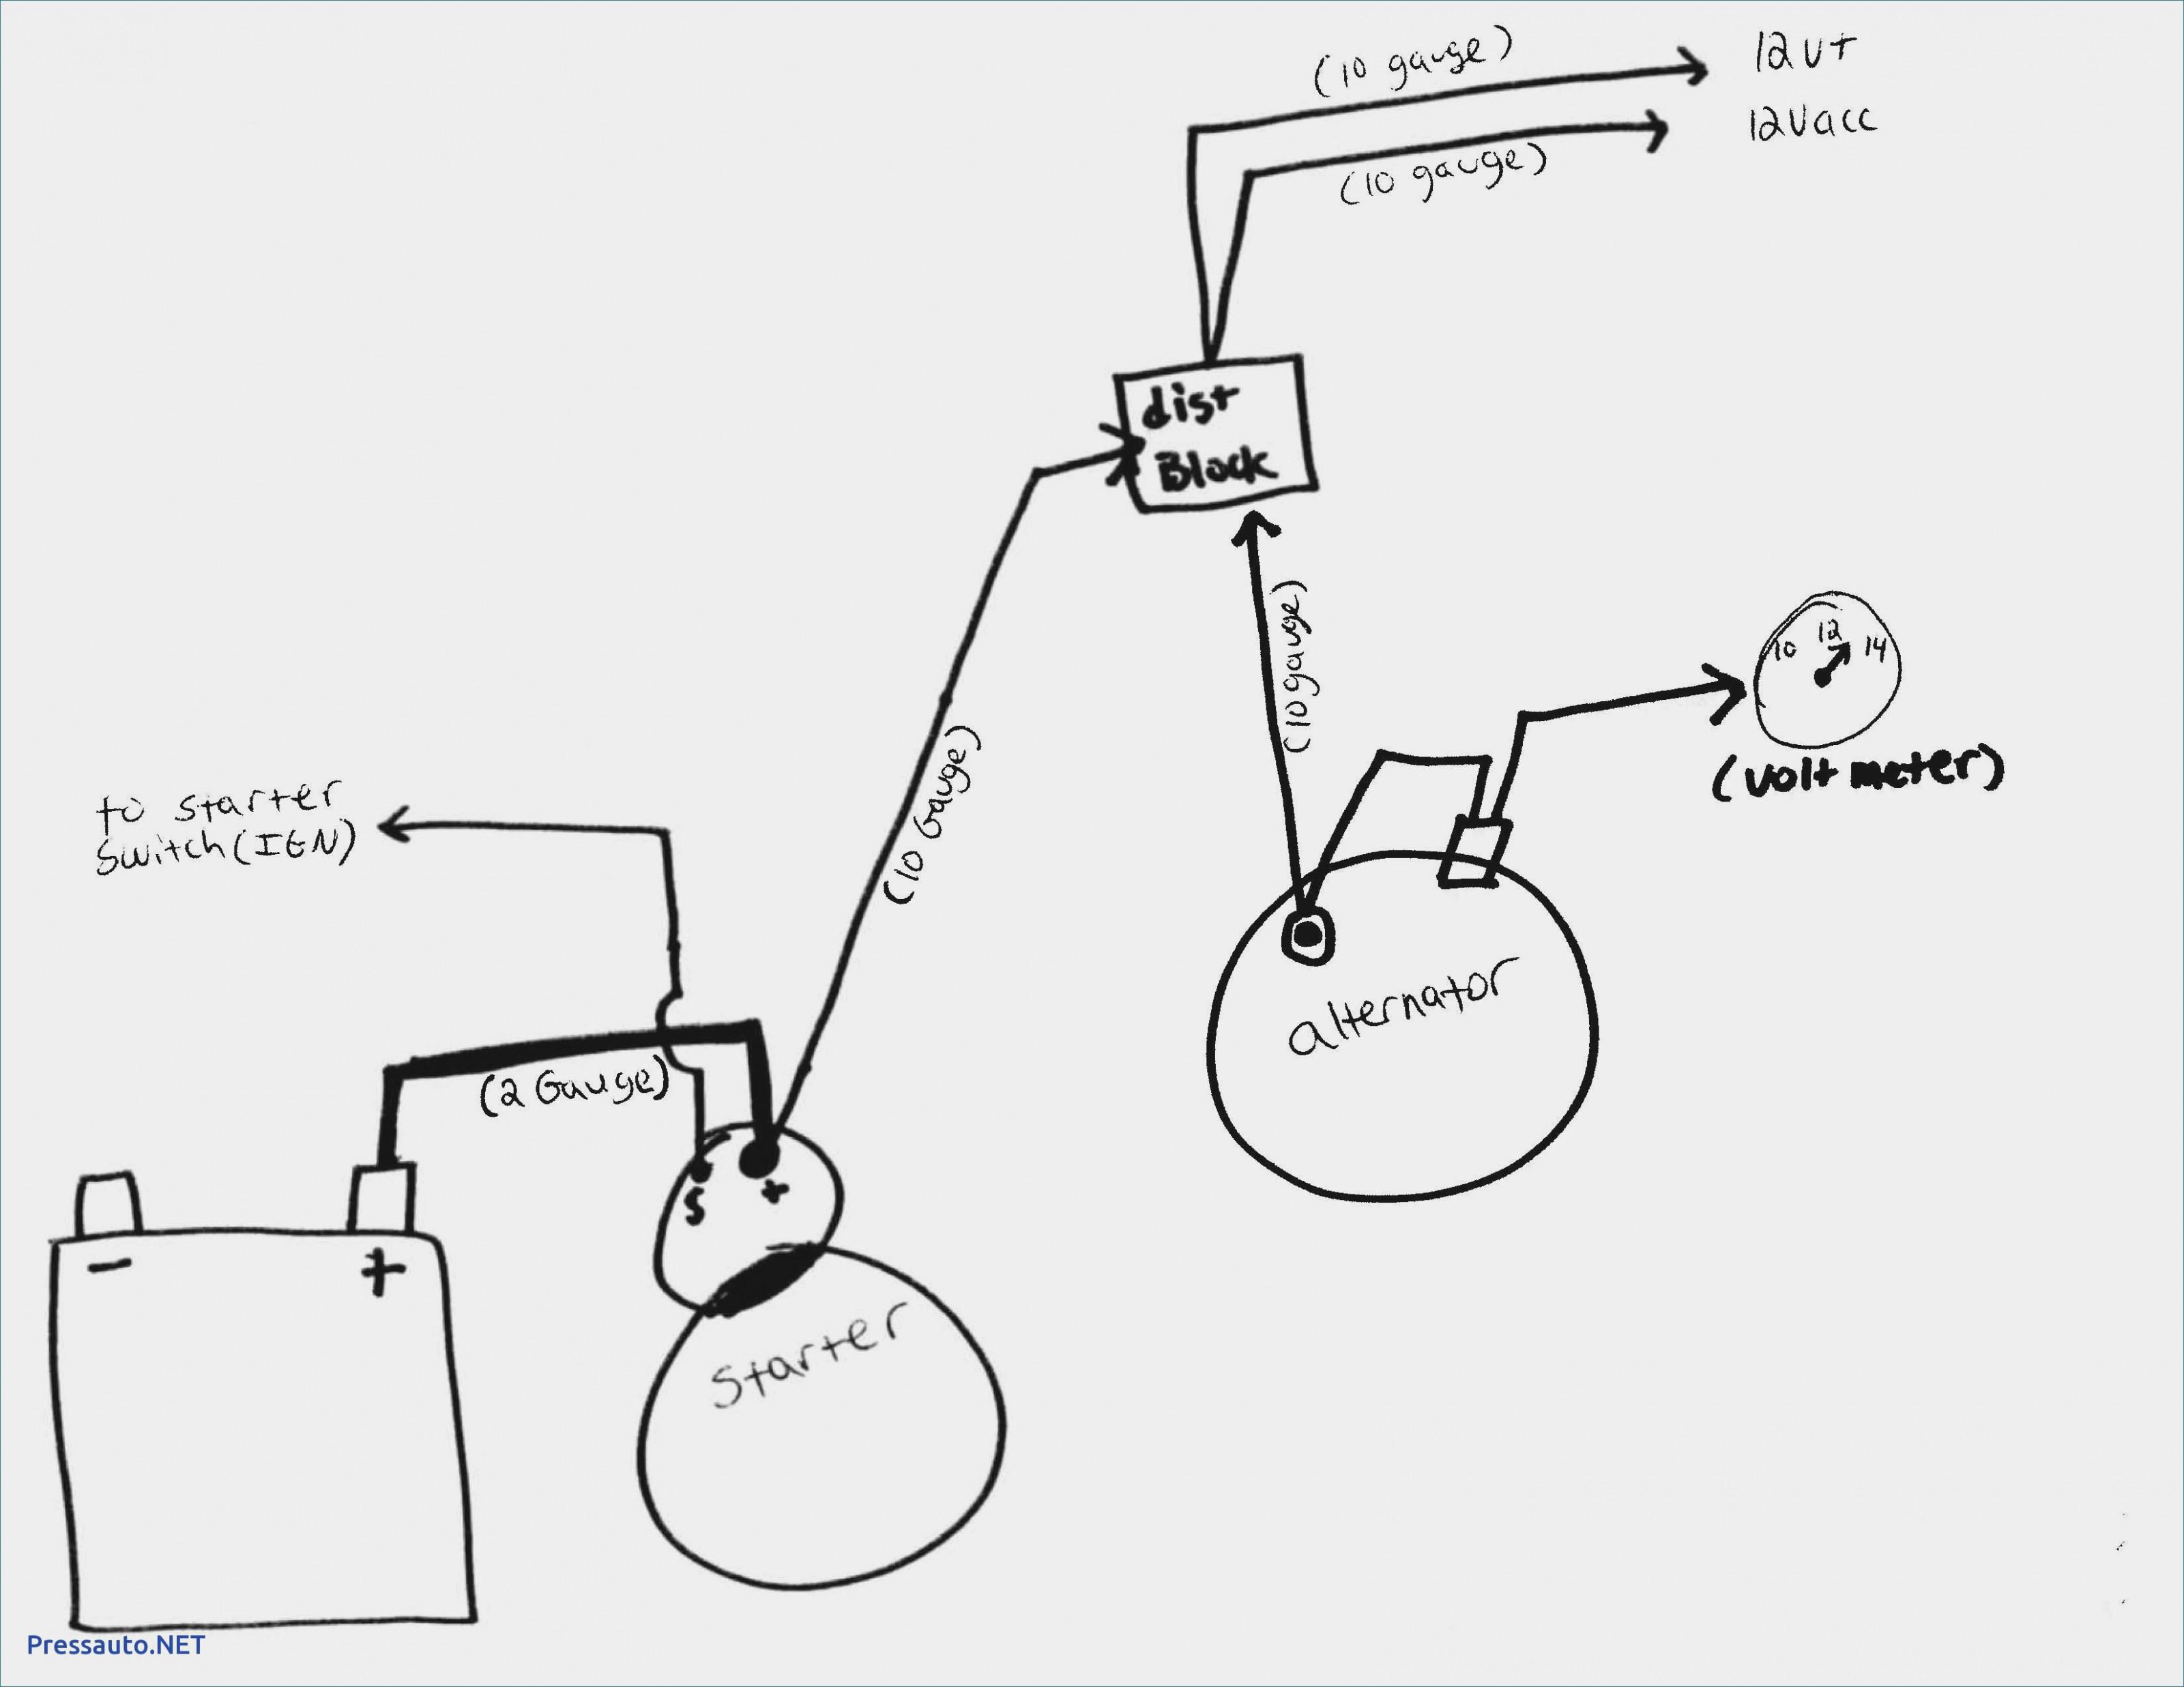 Gm Single Wire Alternator Diagram - Wiring Diagrams Hubs - Gm 1 Wire Alternator Wiring Diagram